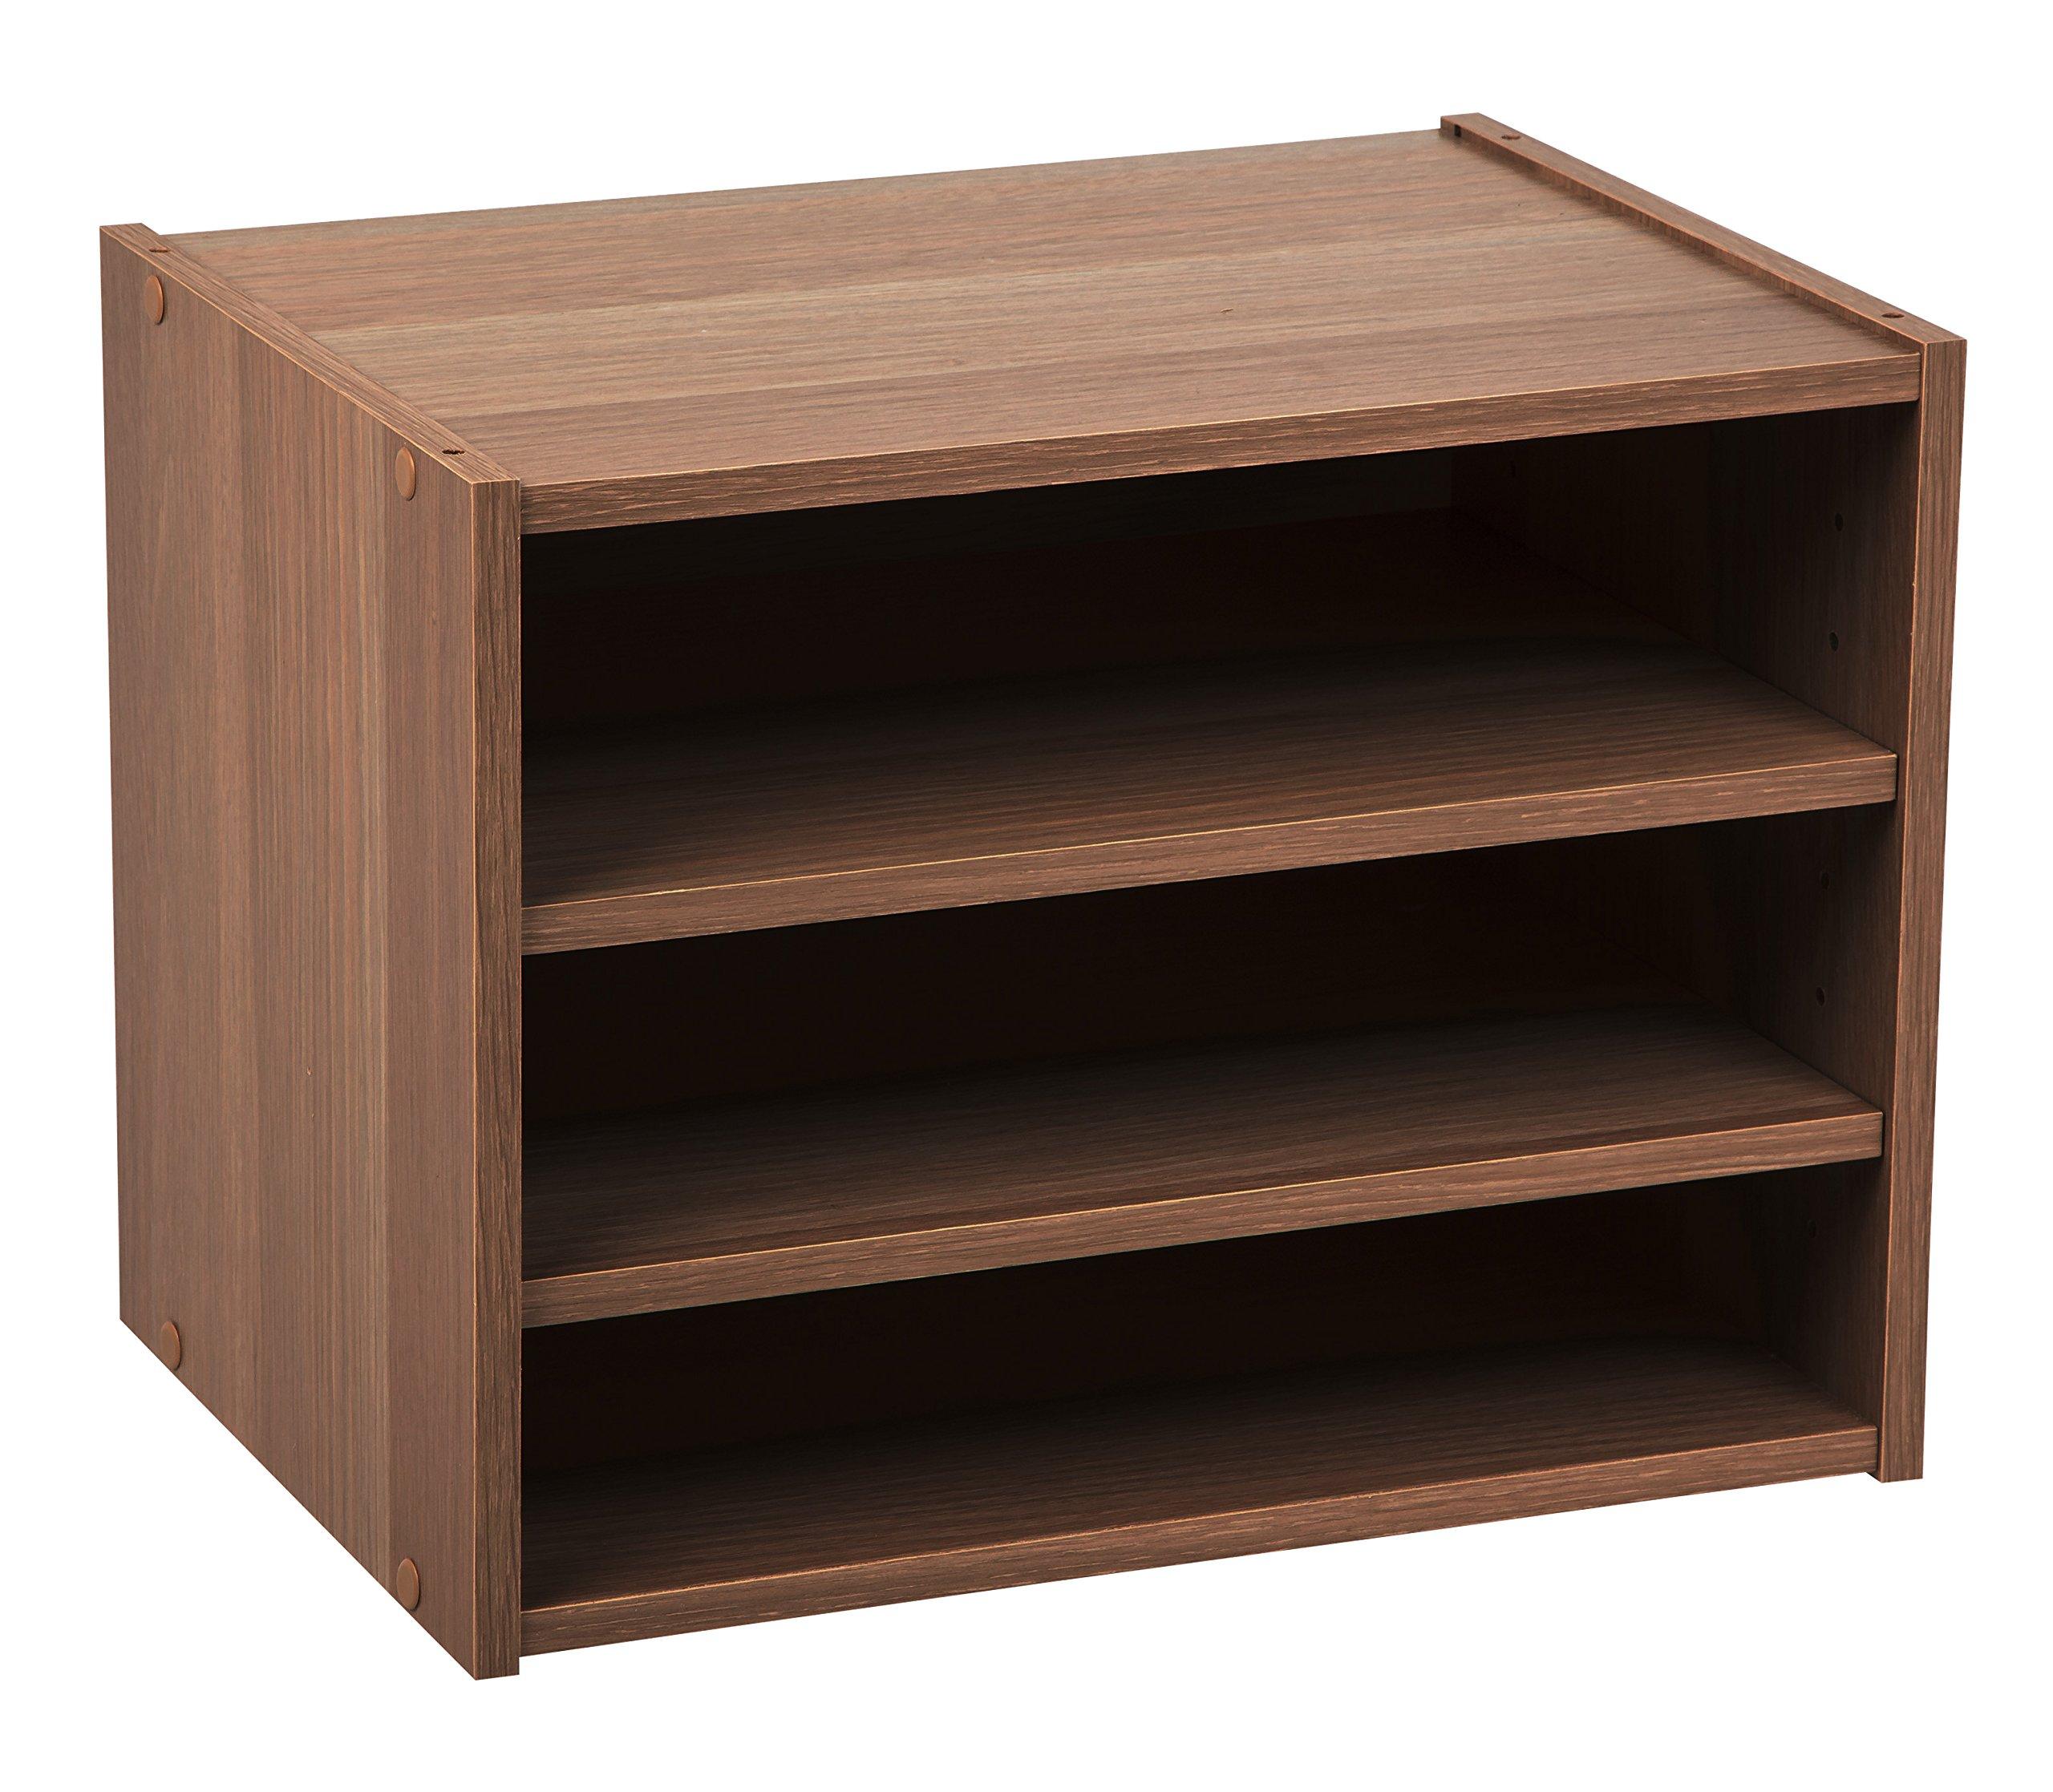 IRIS USA, SBS-DB, Modular Wood Storage Organizer Cube Box with Adjustable Shelves, Dark Brown, 1 Pack